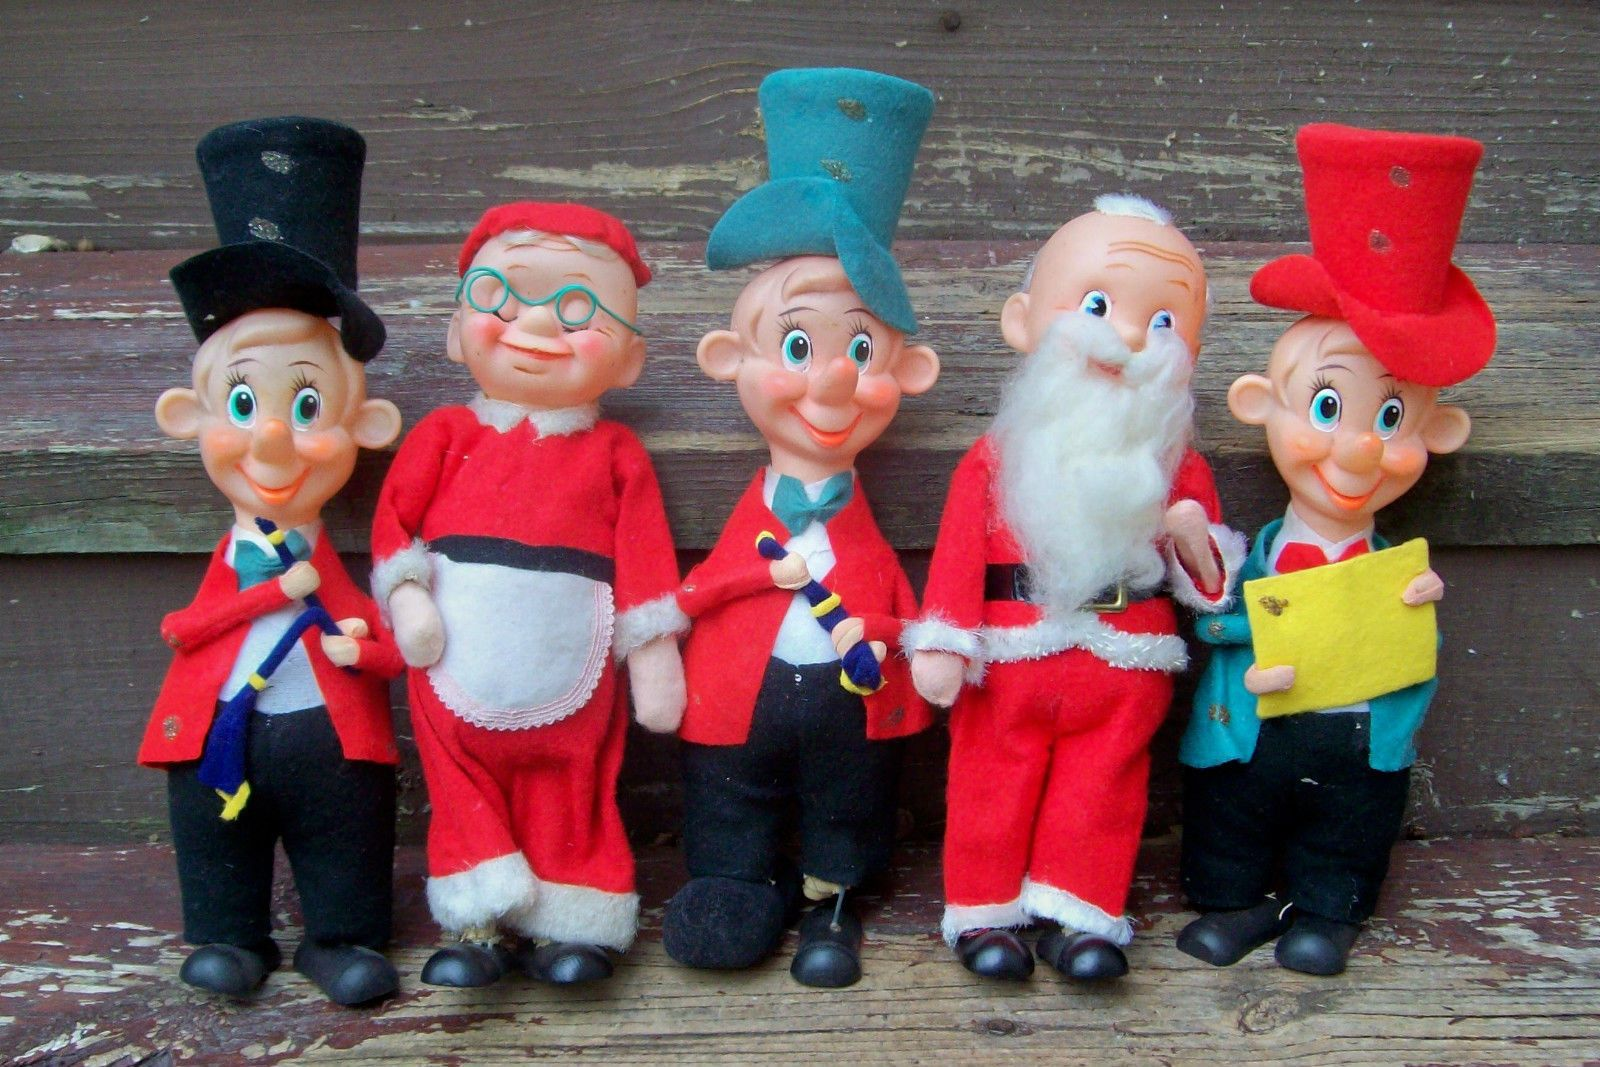 Mr and mrs claus ornaments - Vintage Caroler Band Mr Mrs Claus Santa Felt Doll Ornaments Noel Japan 11in Ebay